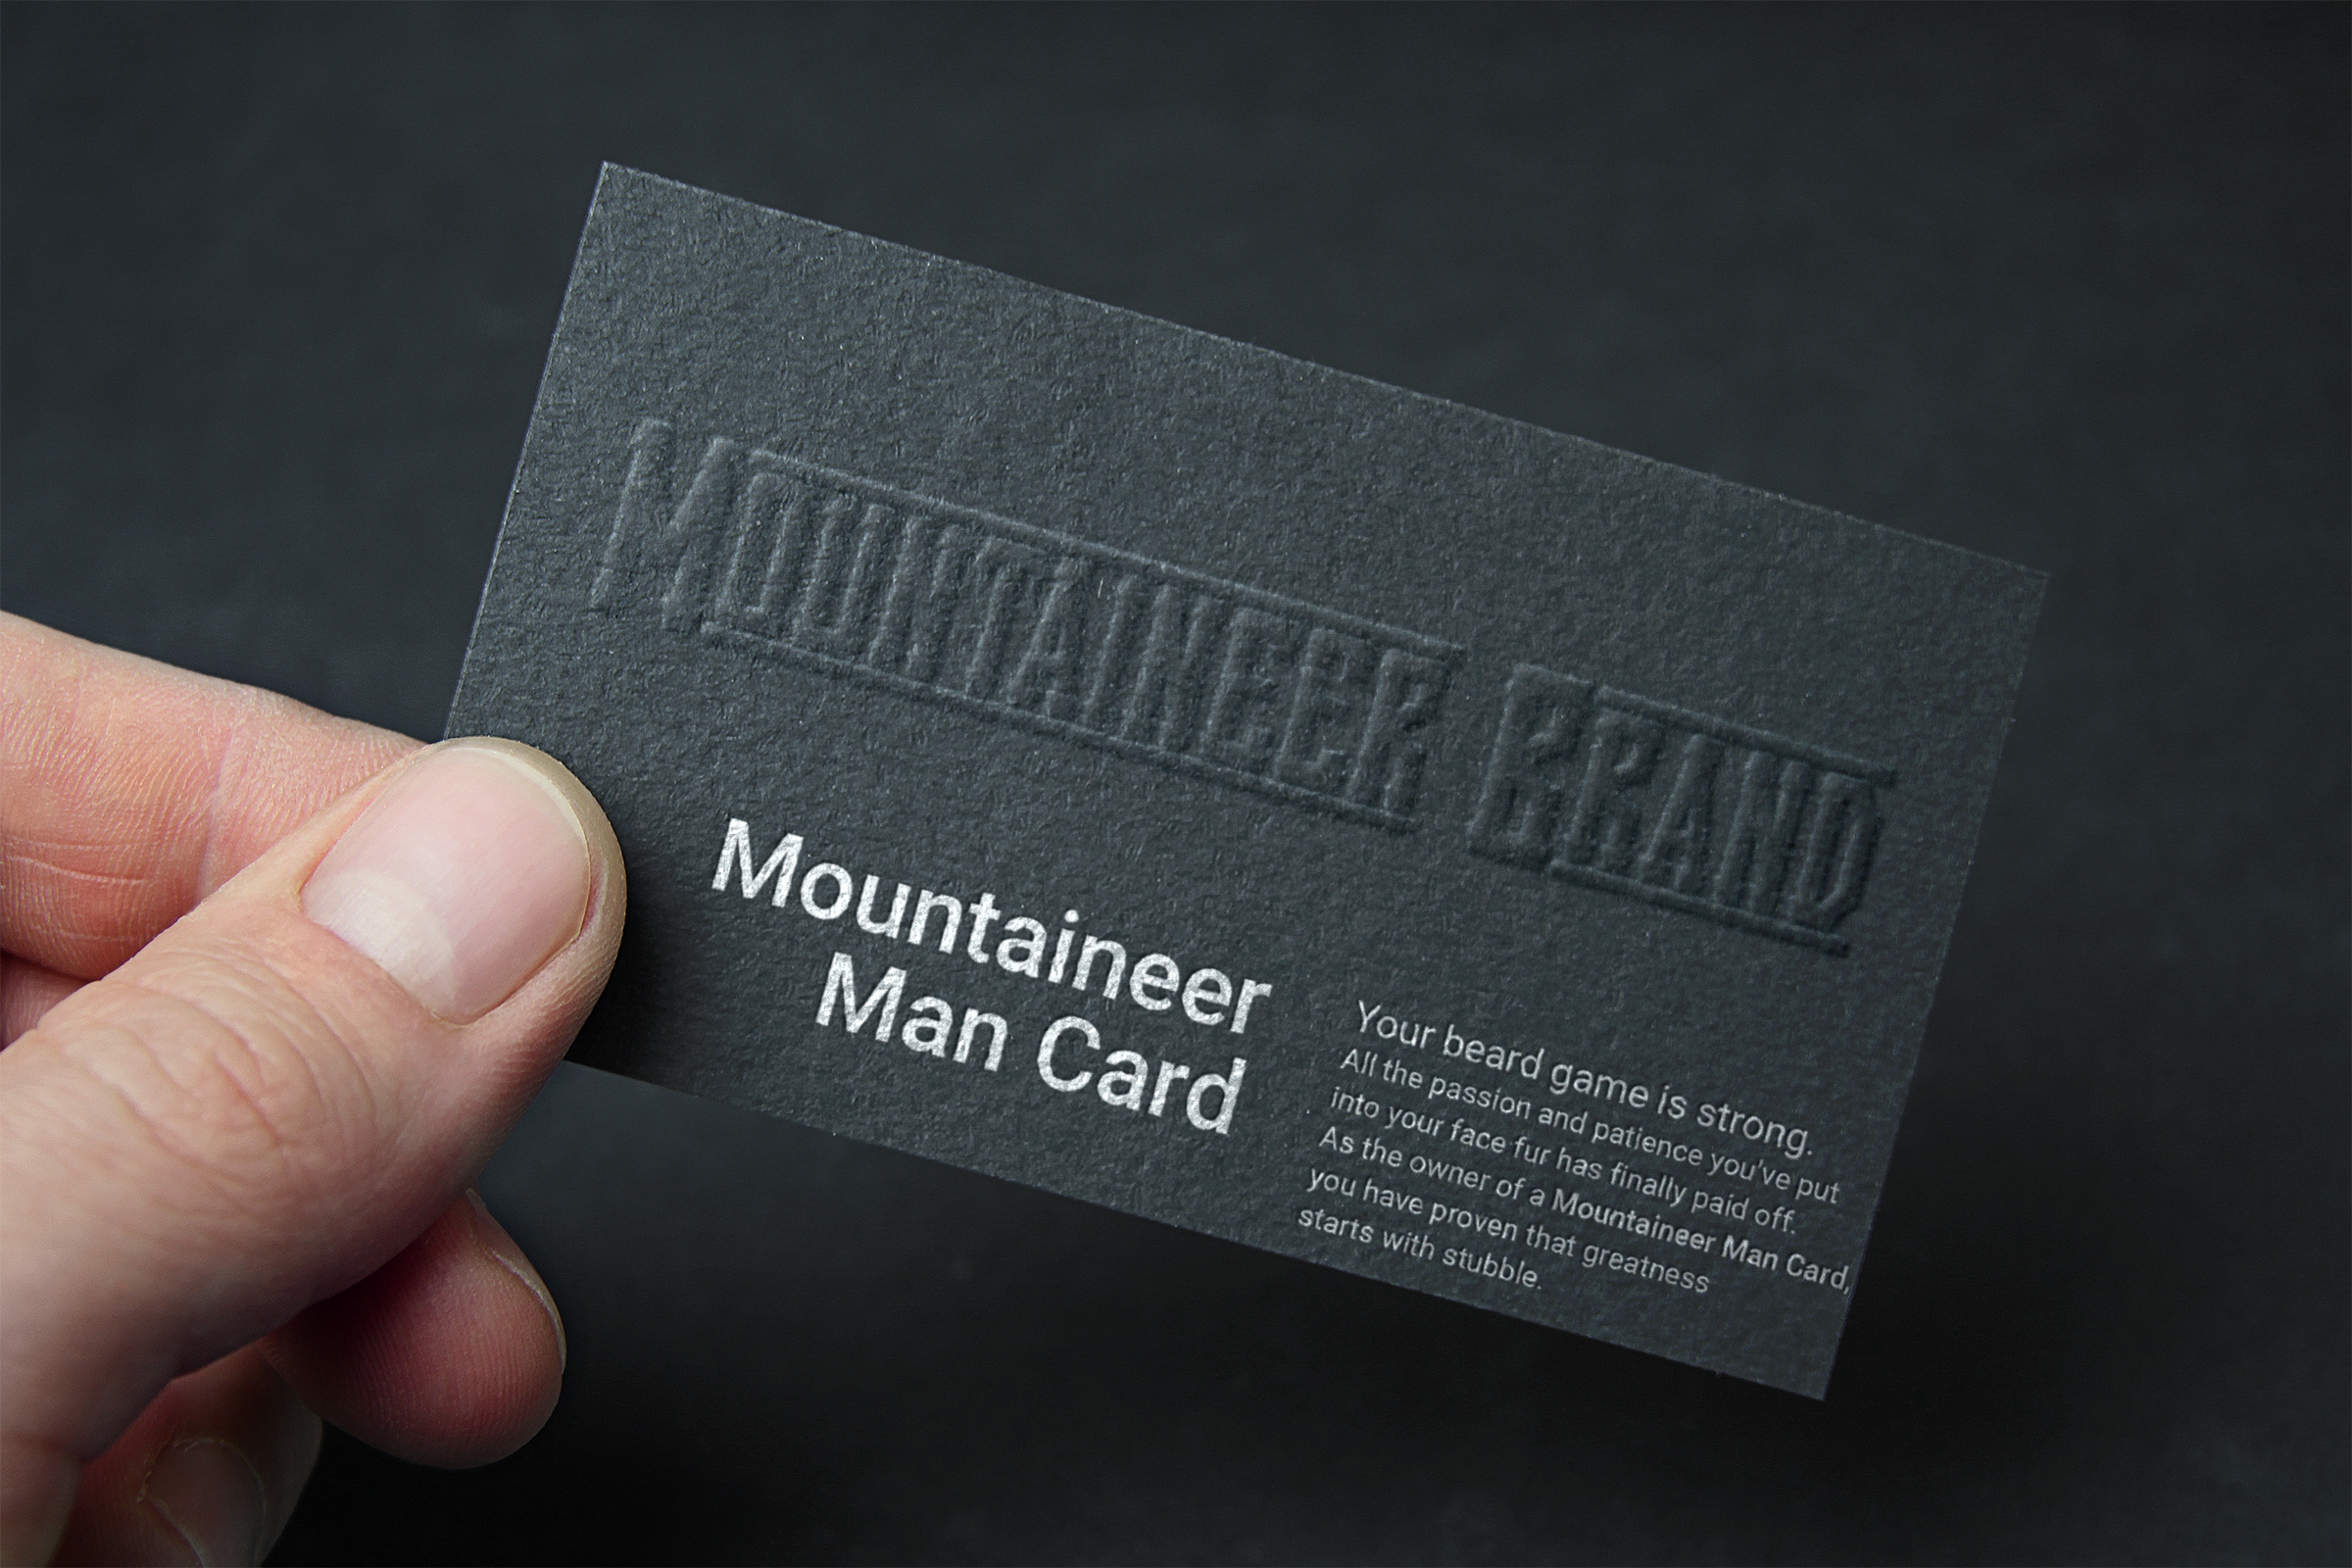 mountaineermancard.jpg